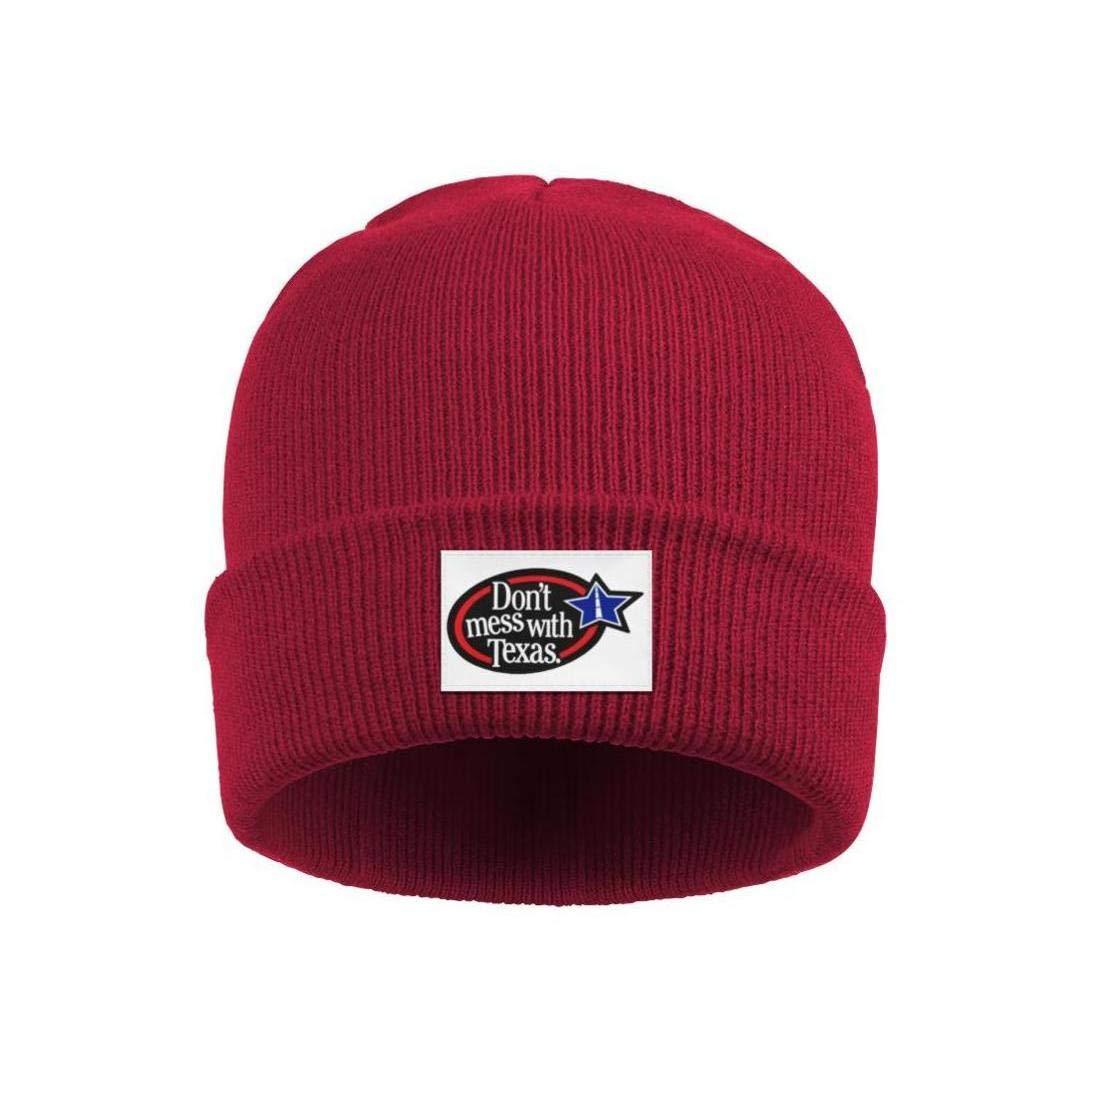 FYFYOK Men Slouchy Beanie Hat Winter Hats Dont Mess with Texas Star Logo Ski Cap